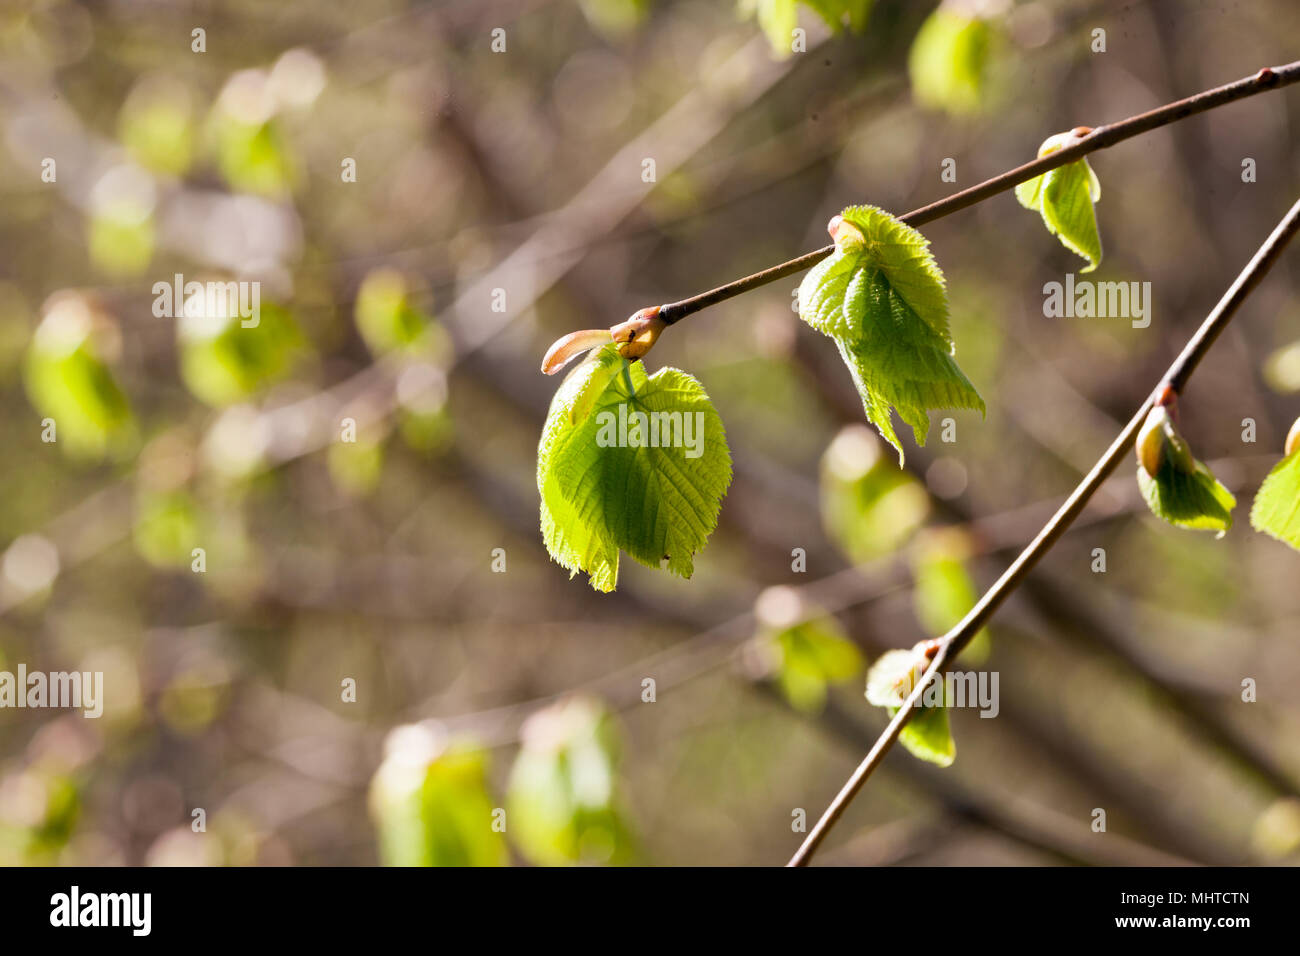 Common Hornbeam, Avenbok (Carpinus betulus) - Stock Image